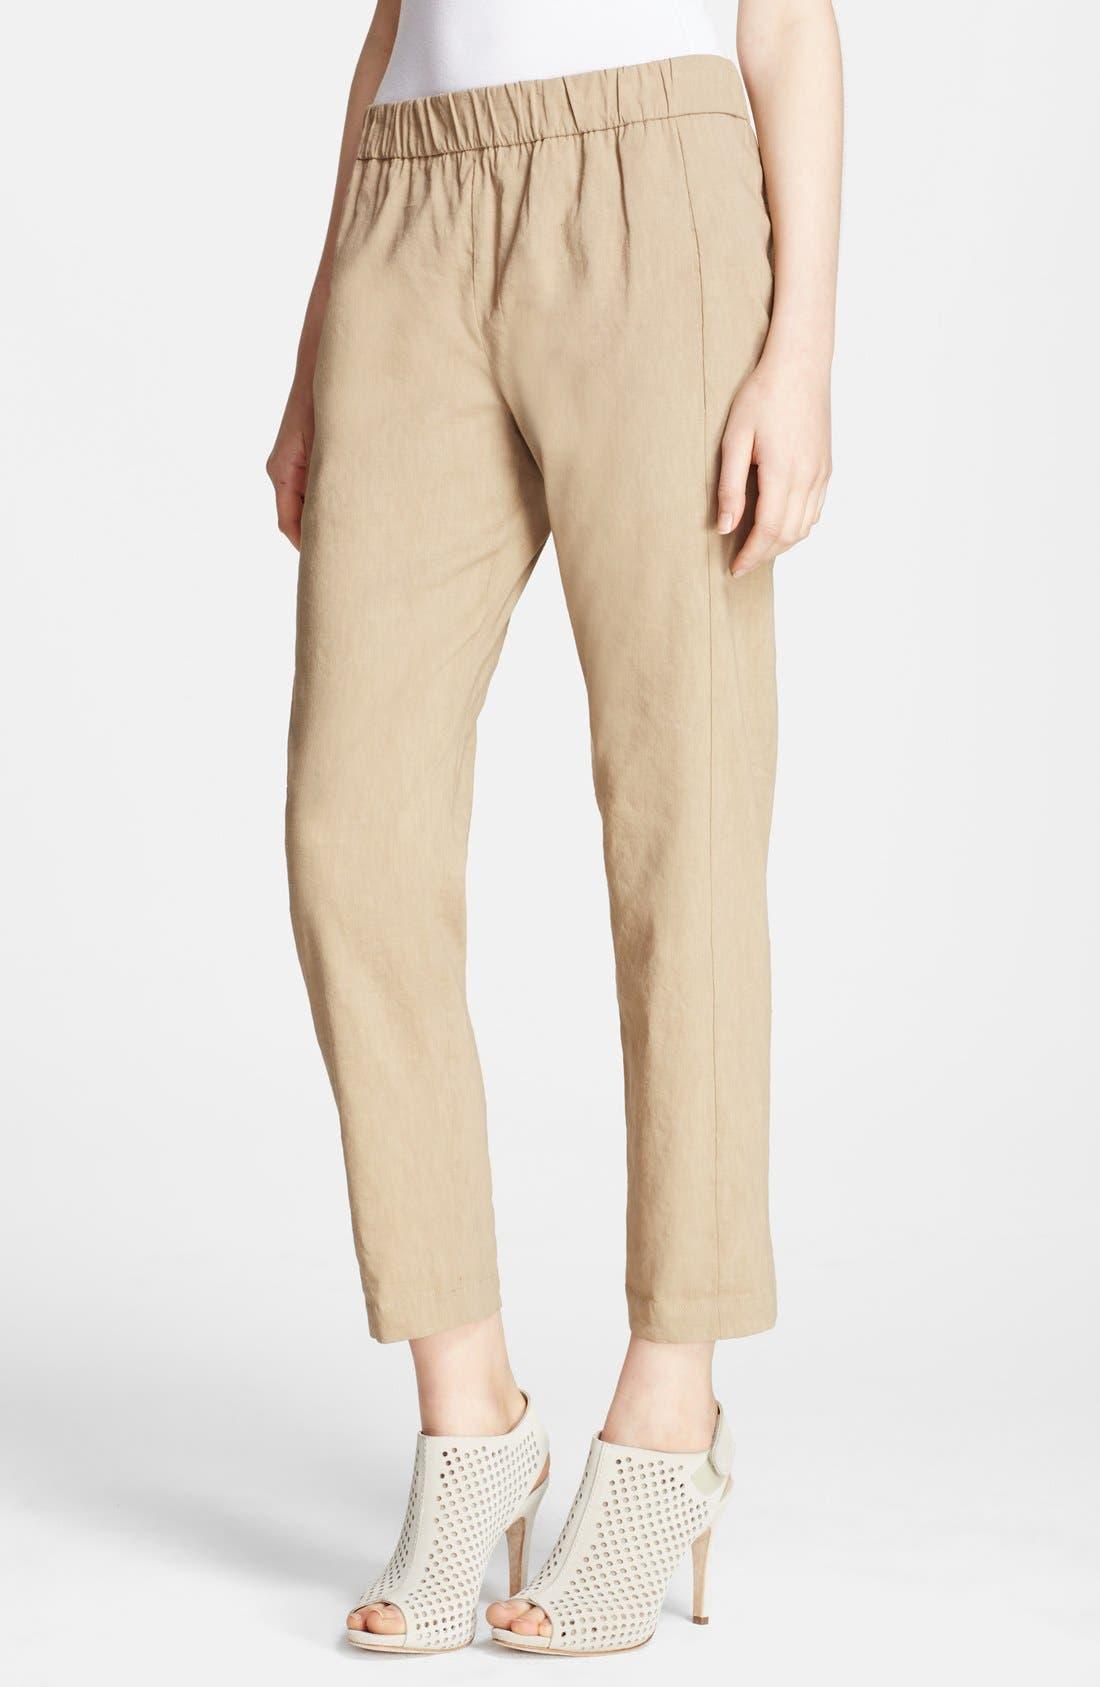 Alternate Image 1 Selected - Theory 'Korene' Crop Linen Blend Pants